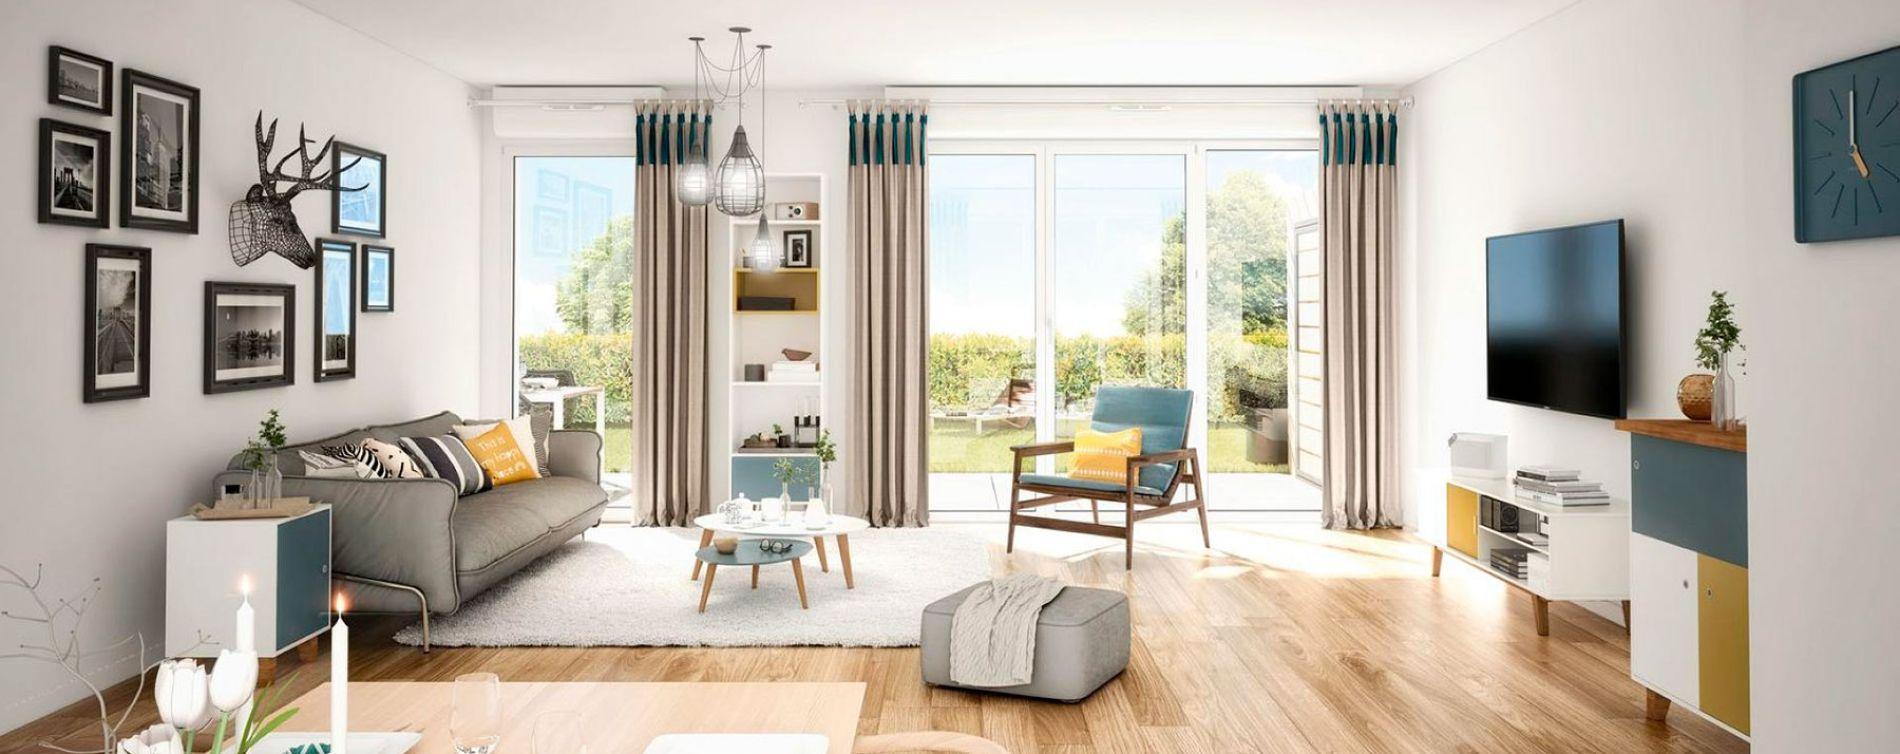 Couëron : programme immobilier neuve « Programme immobilier n°215071 » (3)